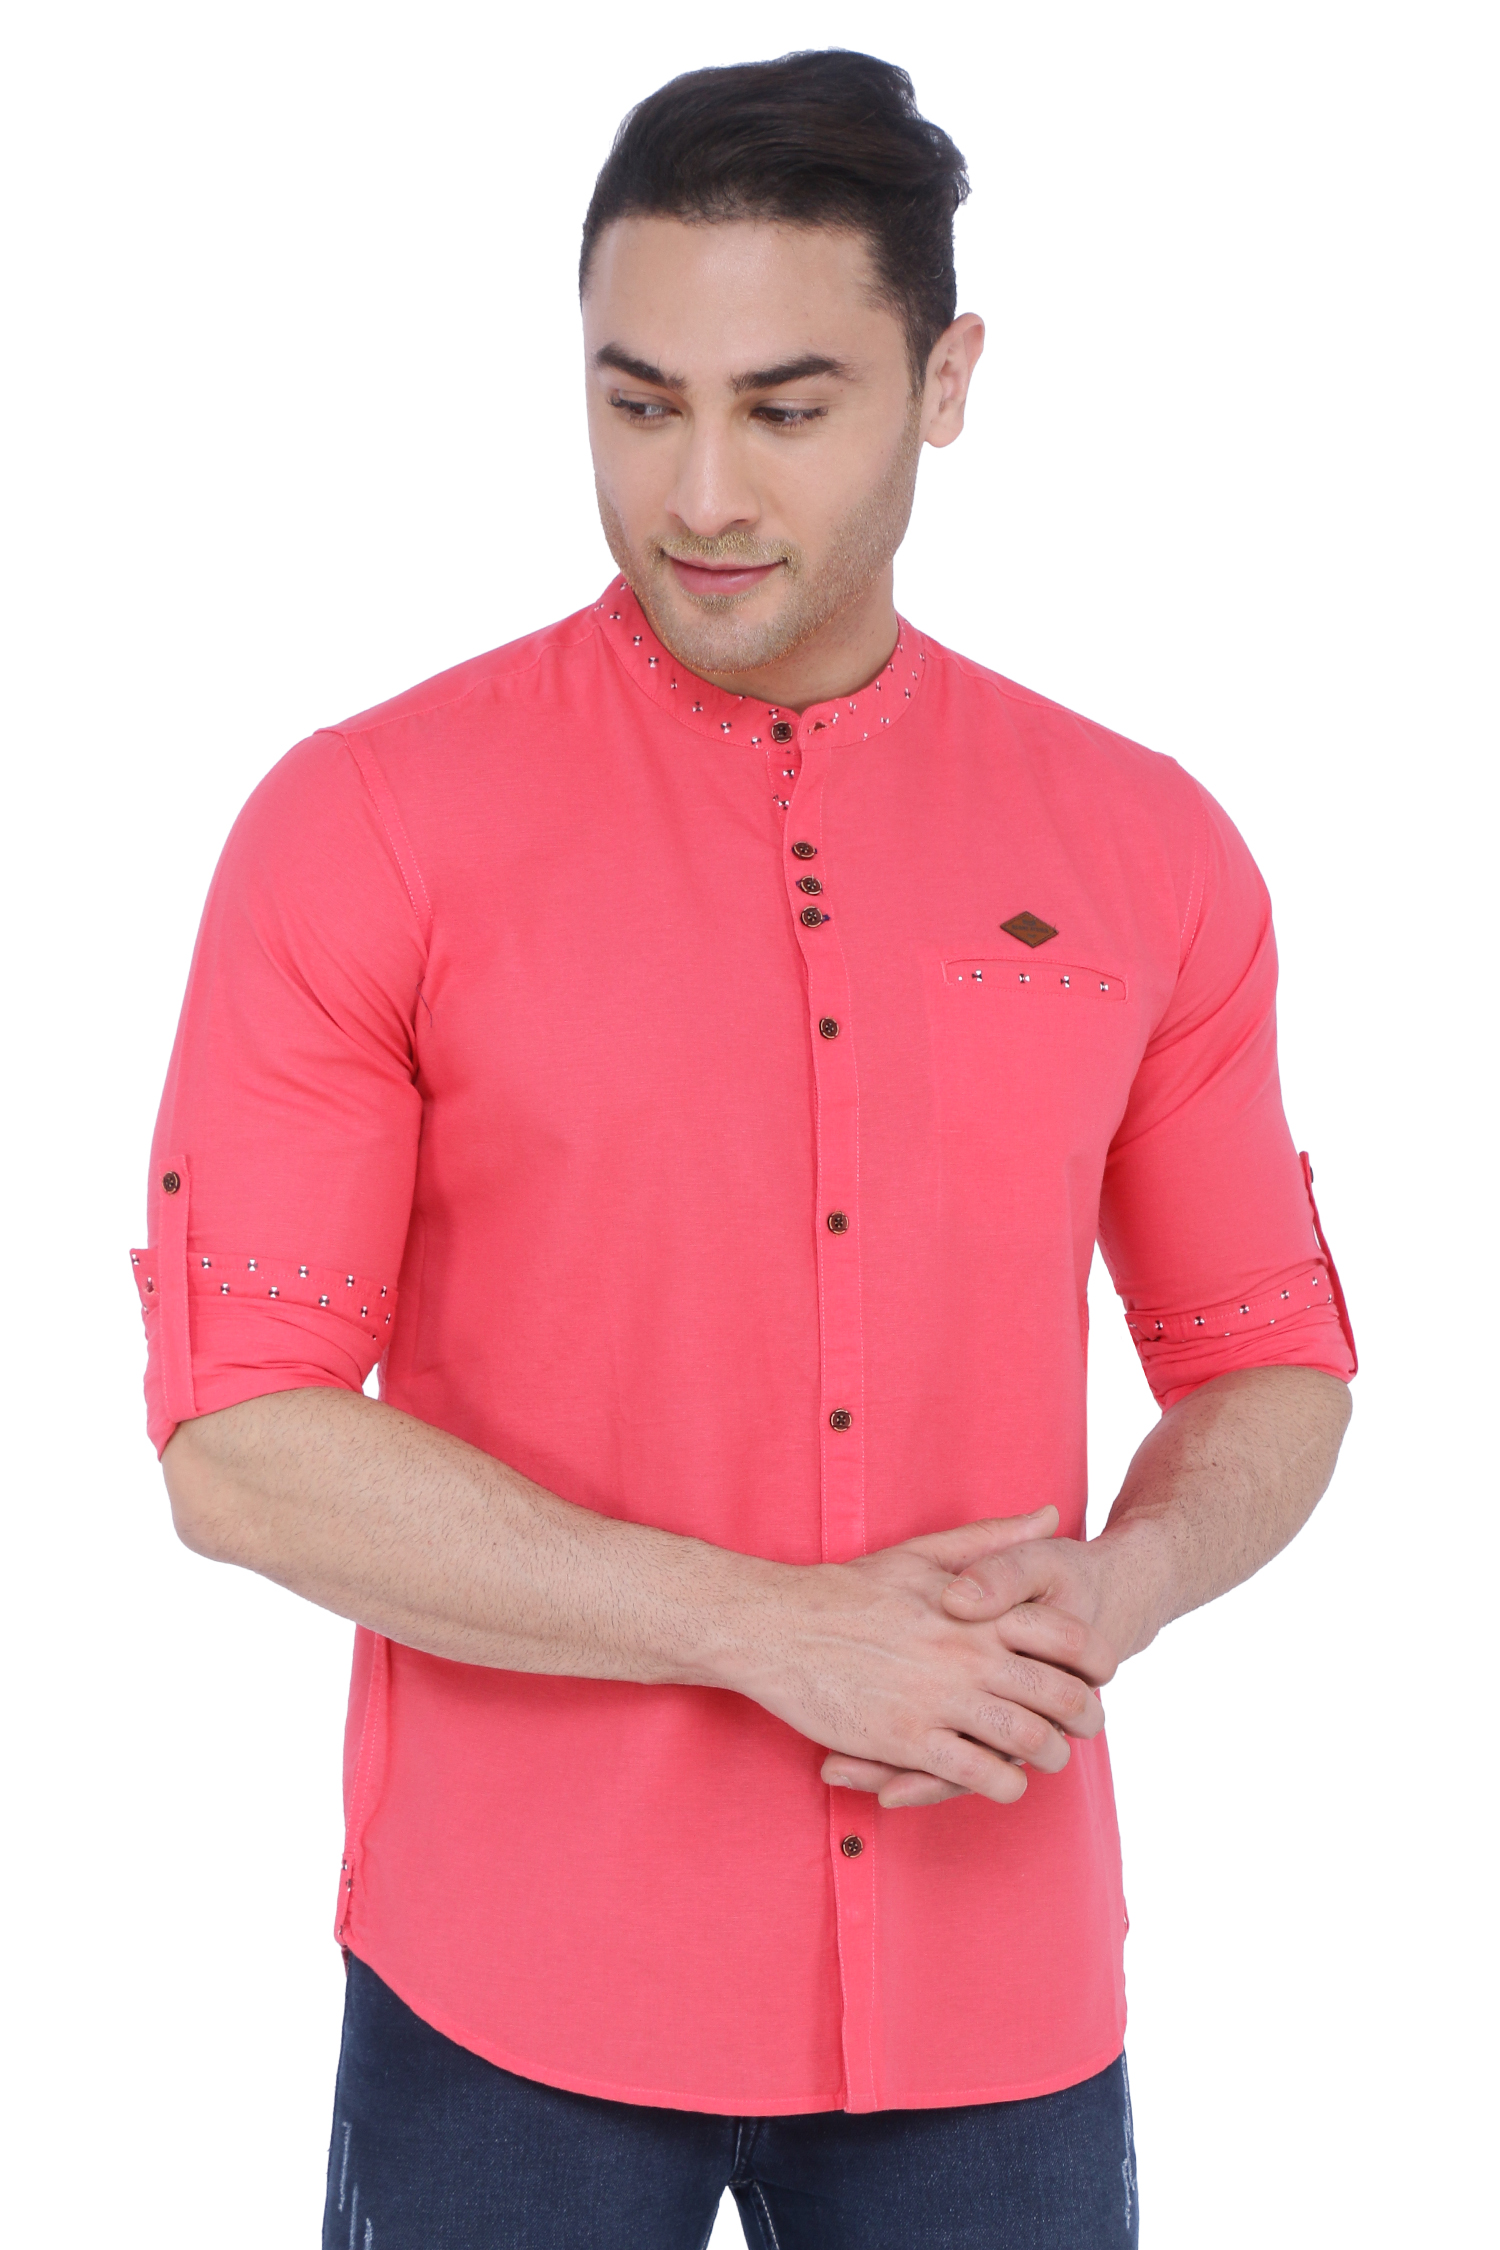 Kuons Avenue   Kuons Avenue Men's Salmon Pink Linen Cotton Shirt- KACLFS1344PK